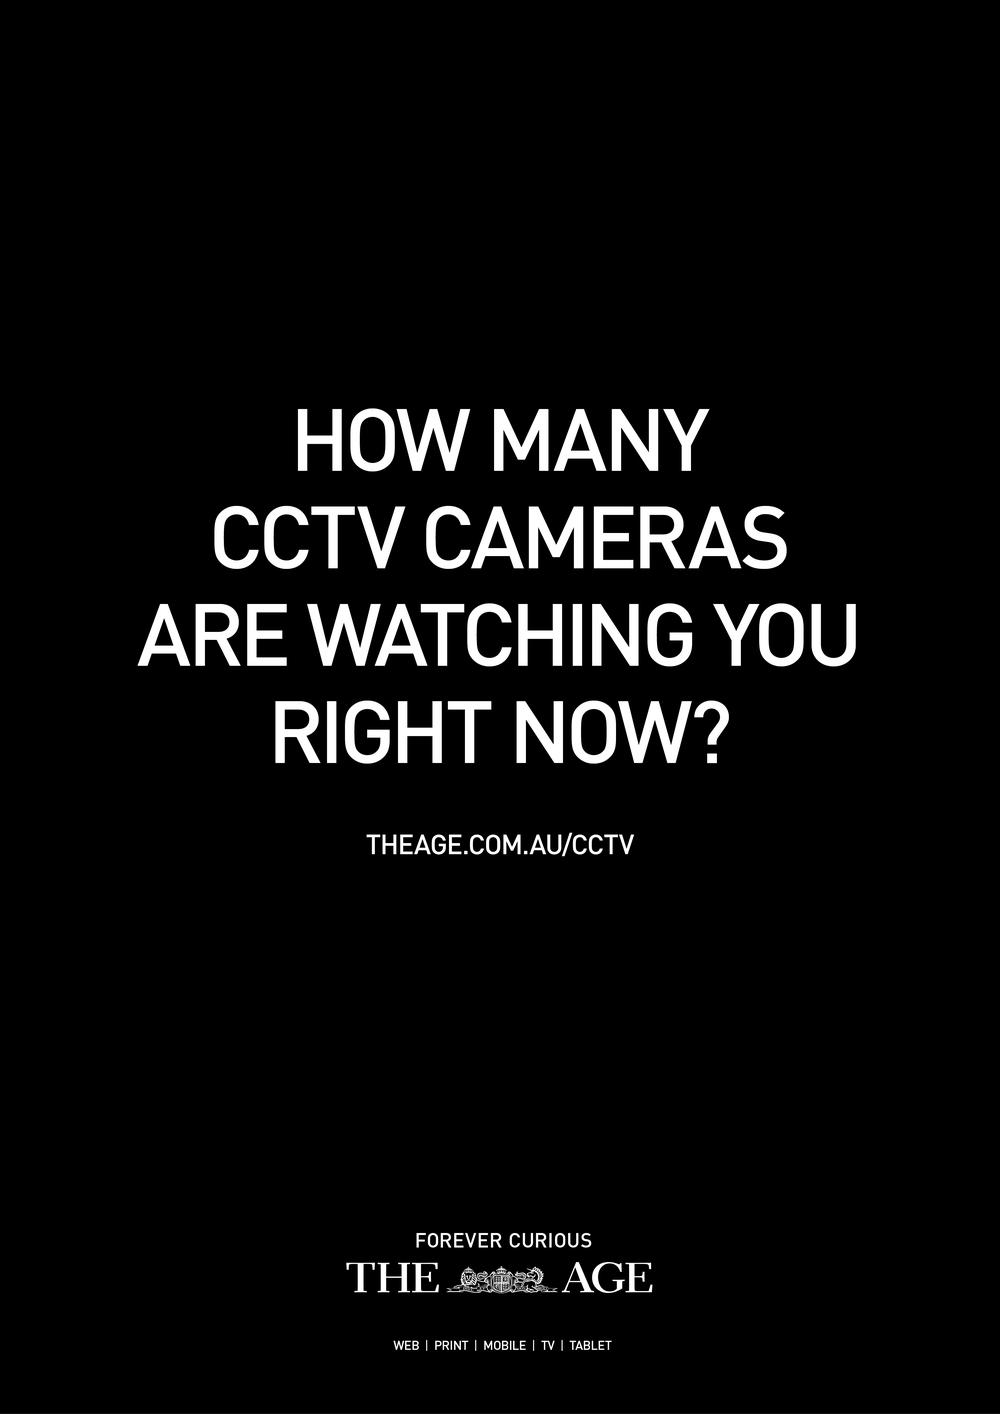 The Age_CCTV_OOH.jpg